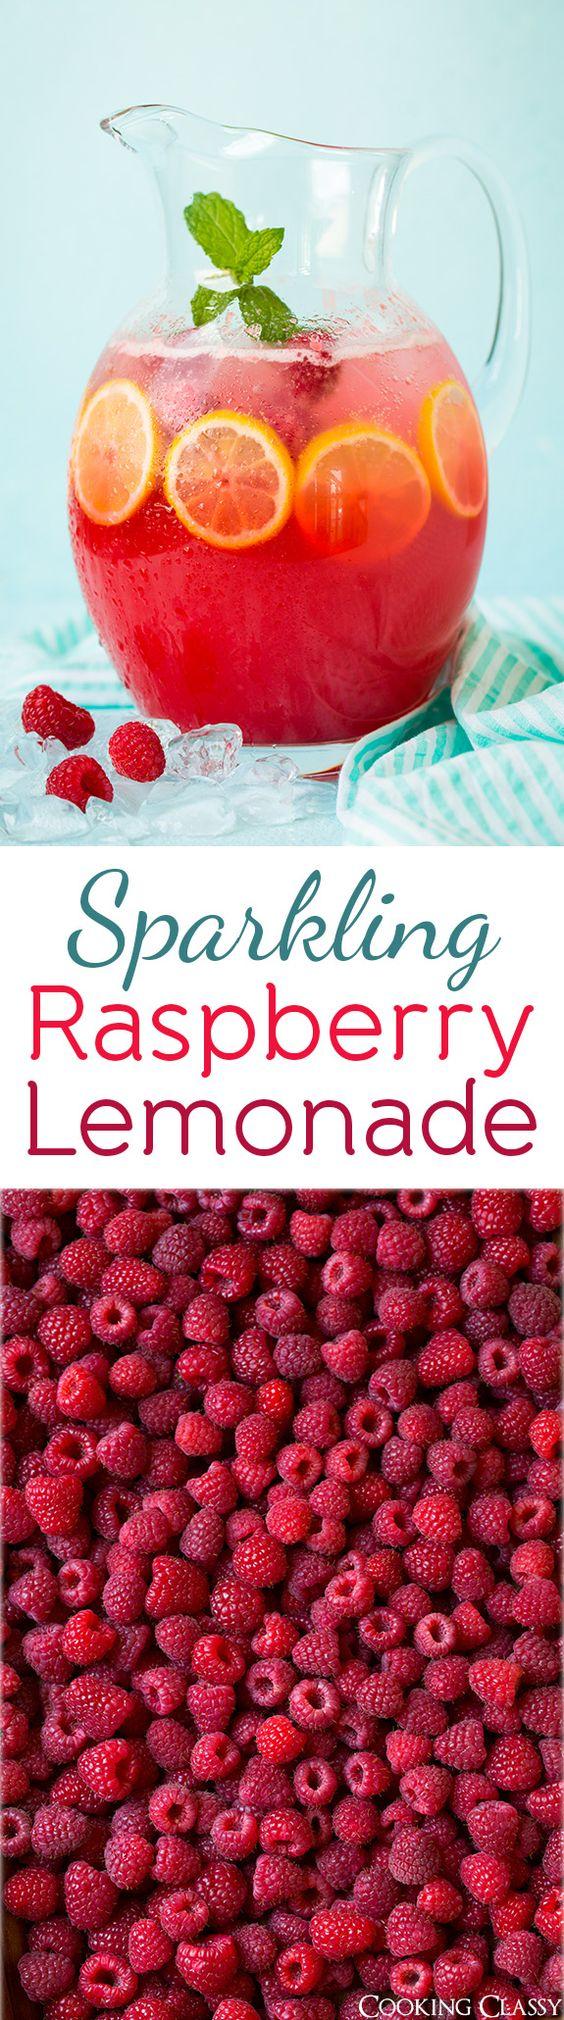 Sparkling Raspberry Lemonade - the ultimate refreshing summer drink ...